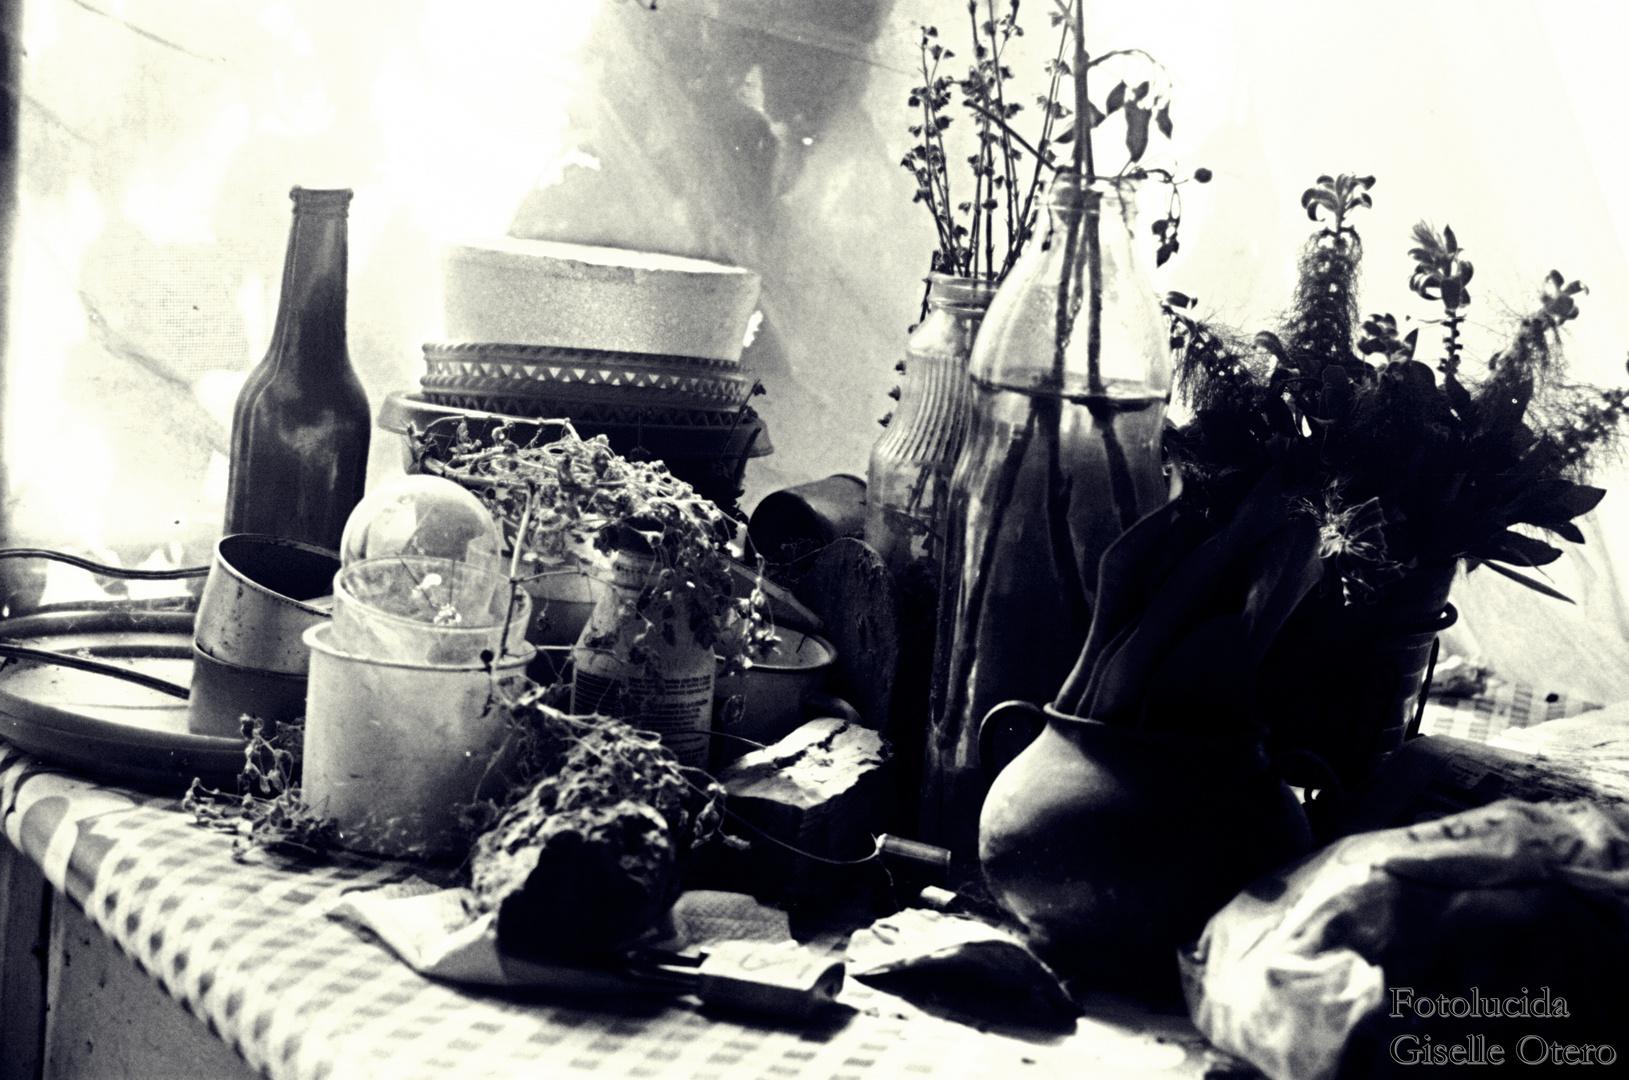 objetos olvidados